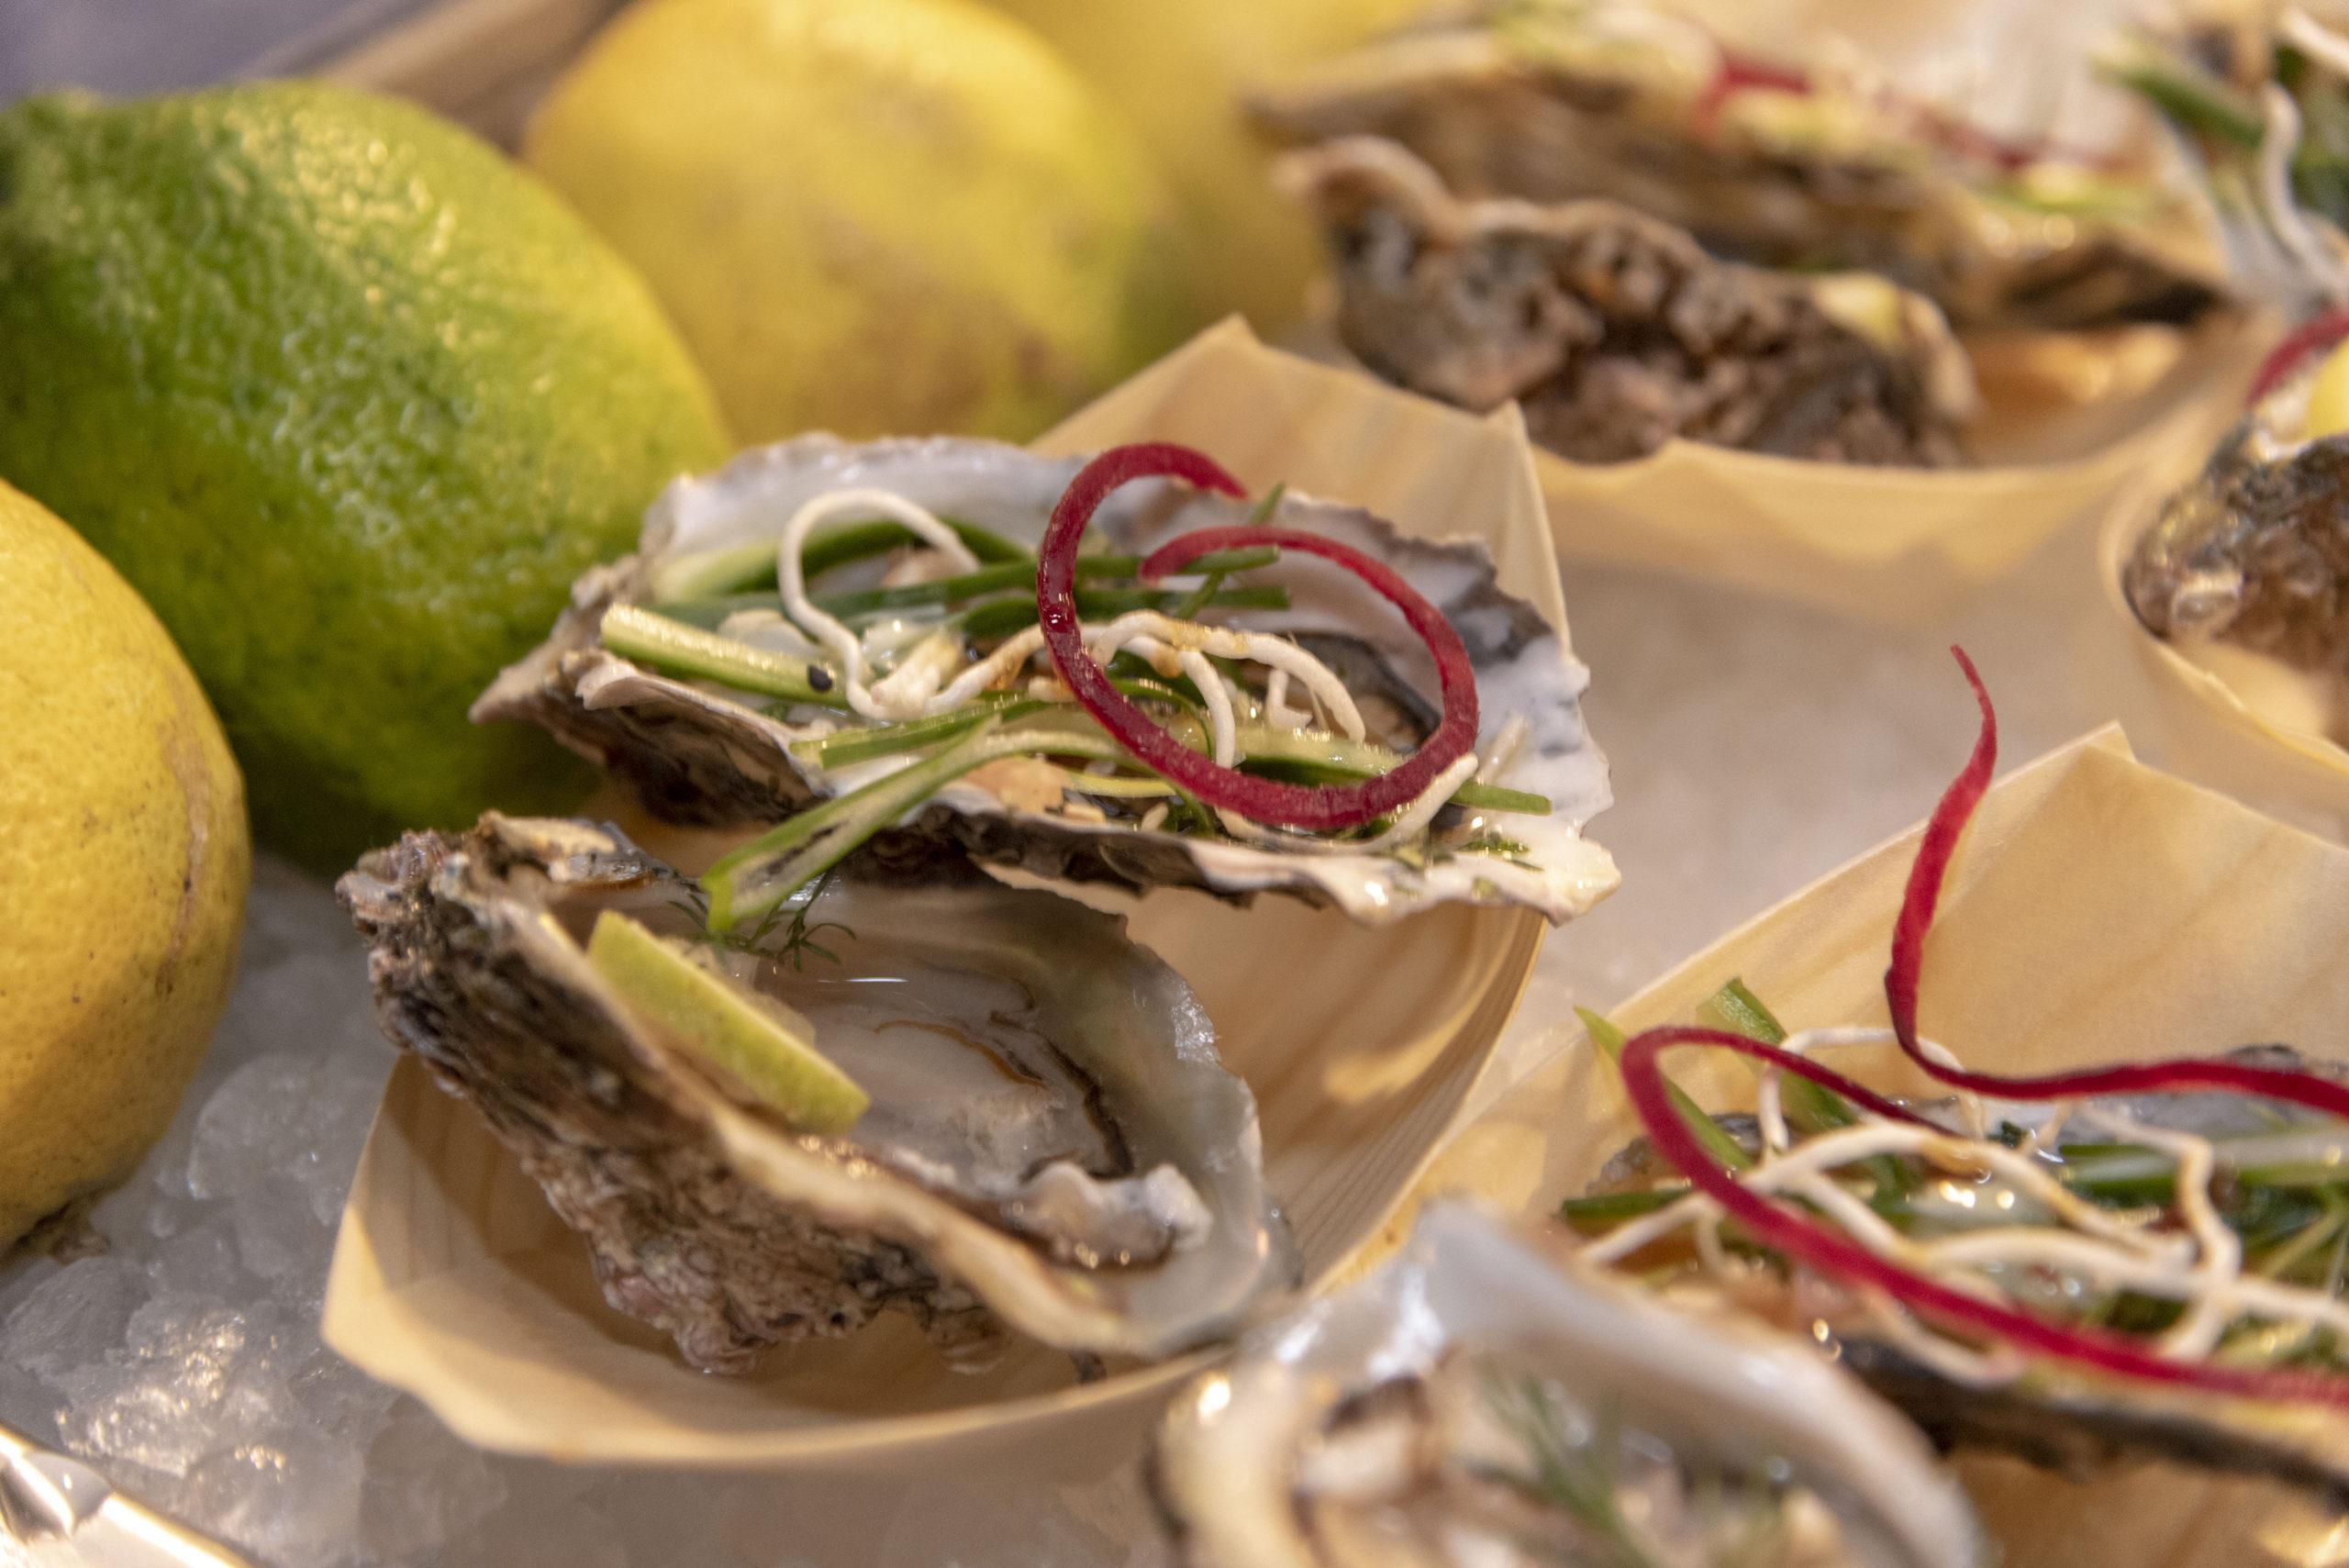 knysna oyster festival south africa travel